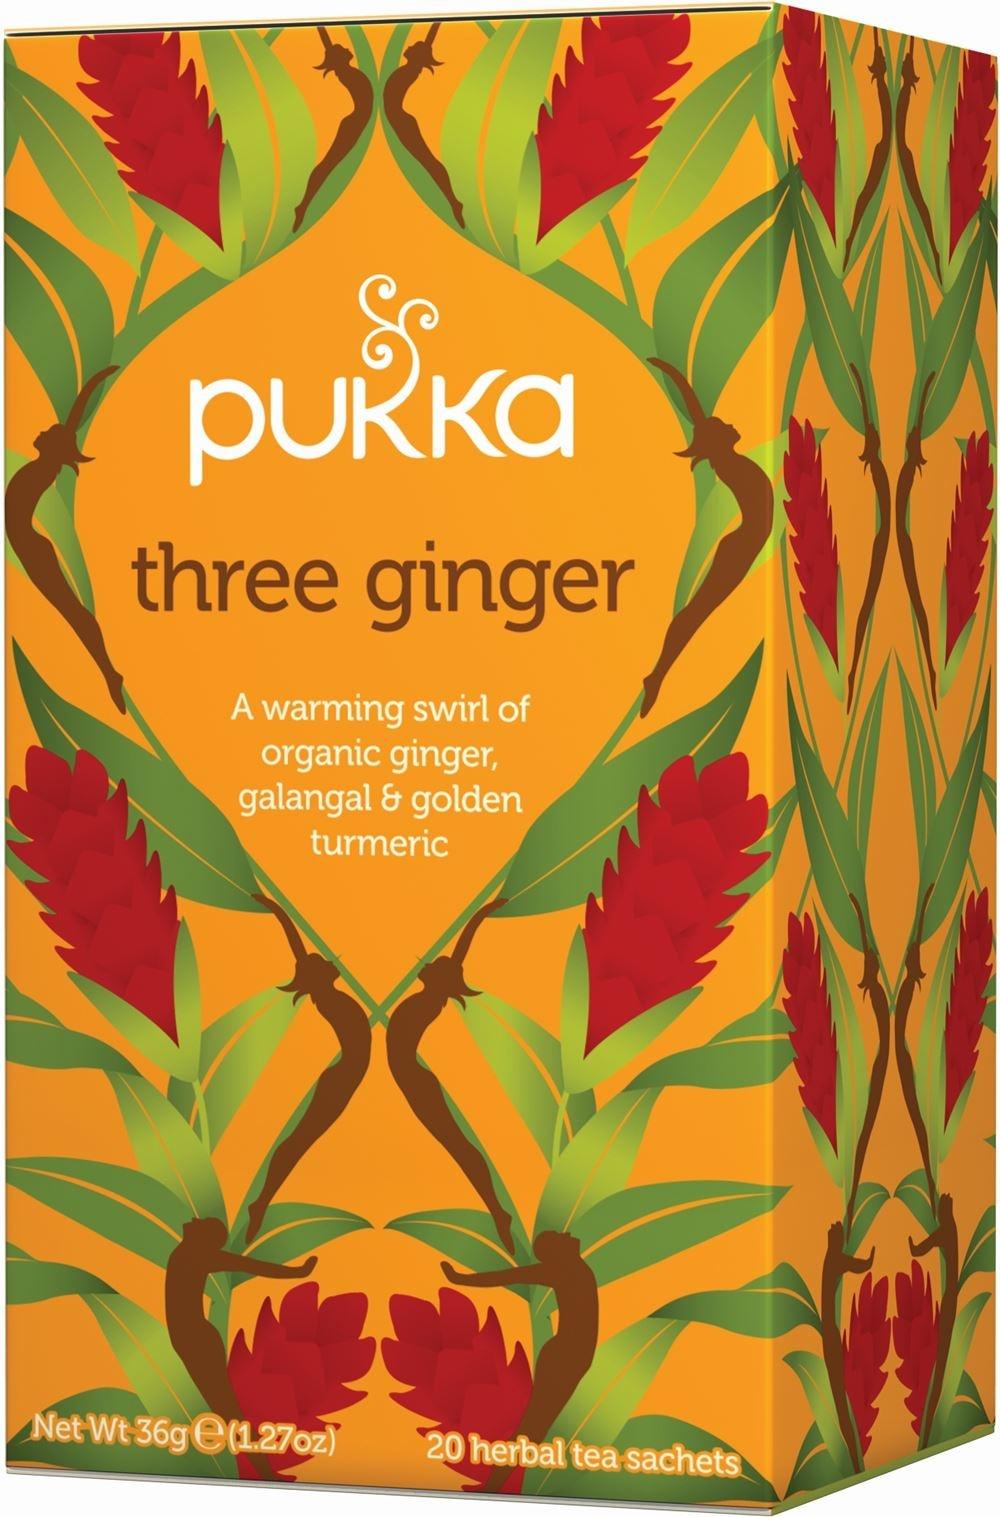 Pukka Three Ginger Herbal Tea x 20 bags